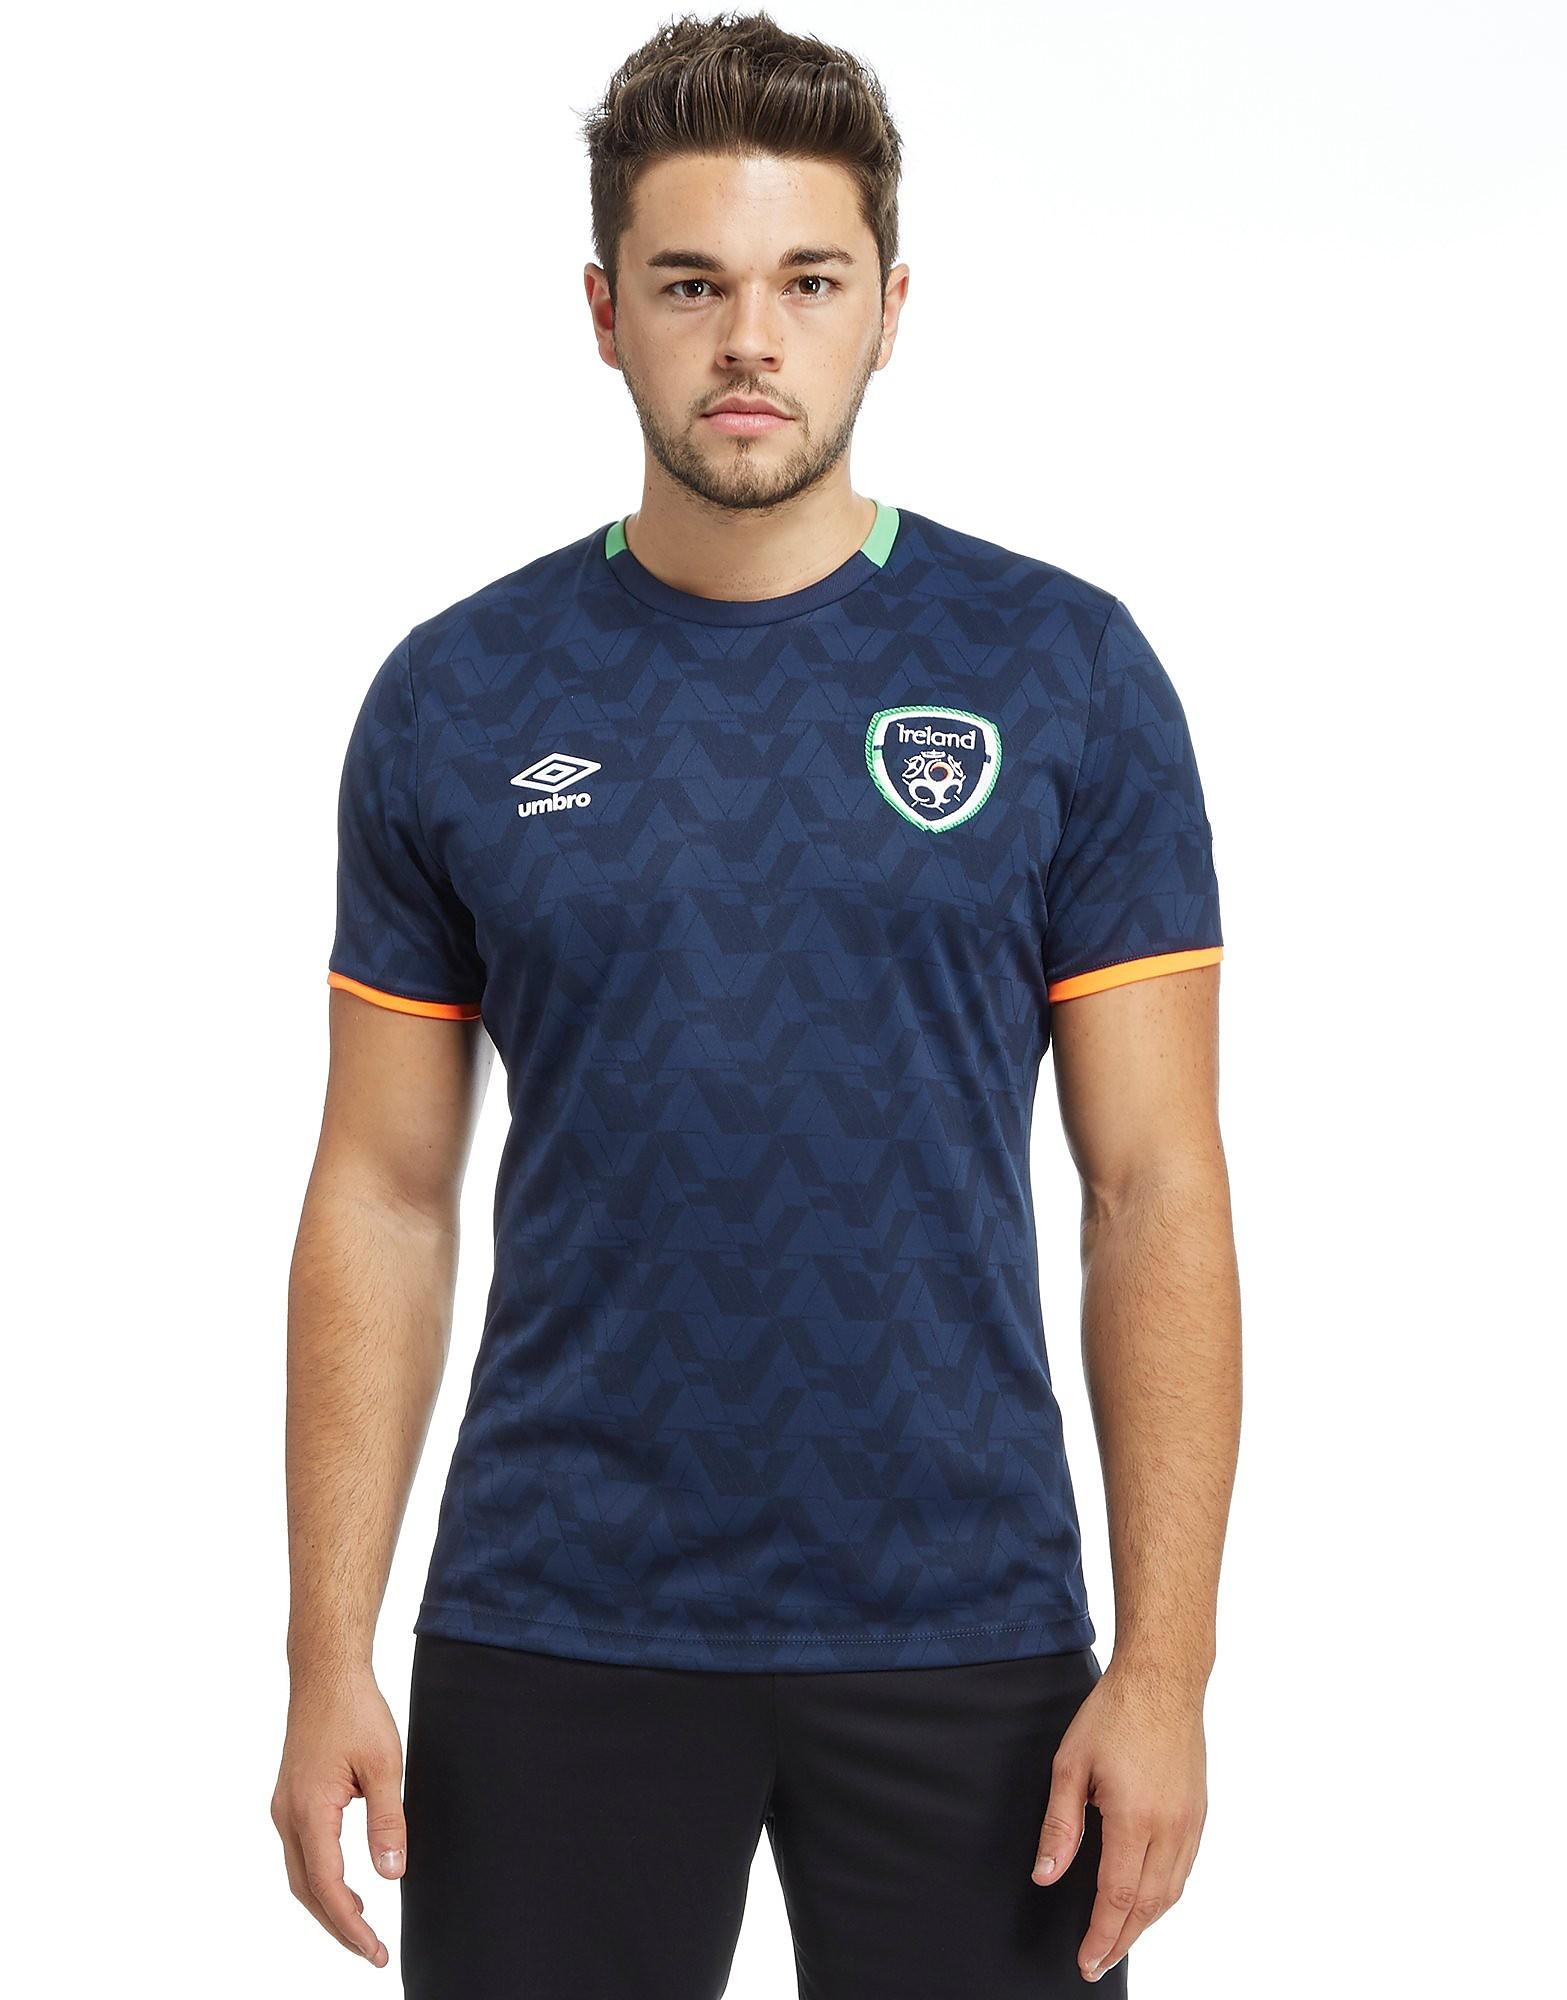 Umbro Republic of Ireland 2016/17 Training Shirt